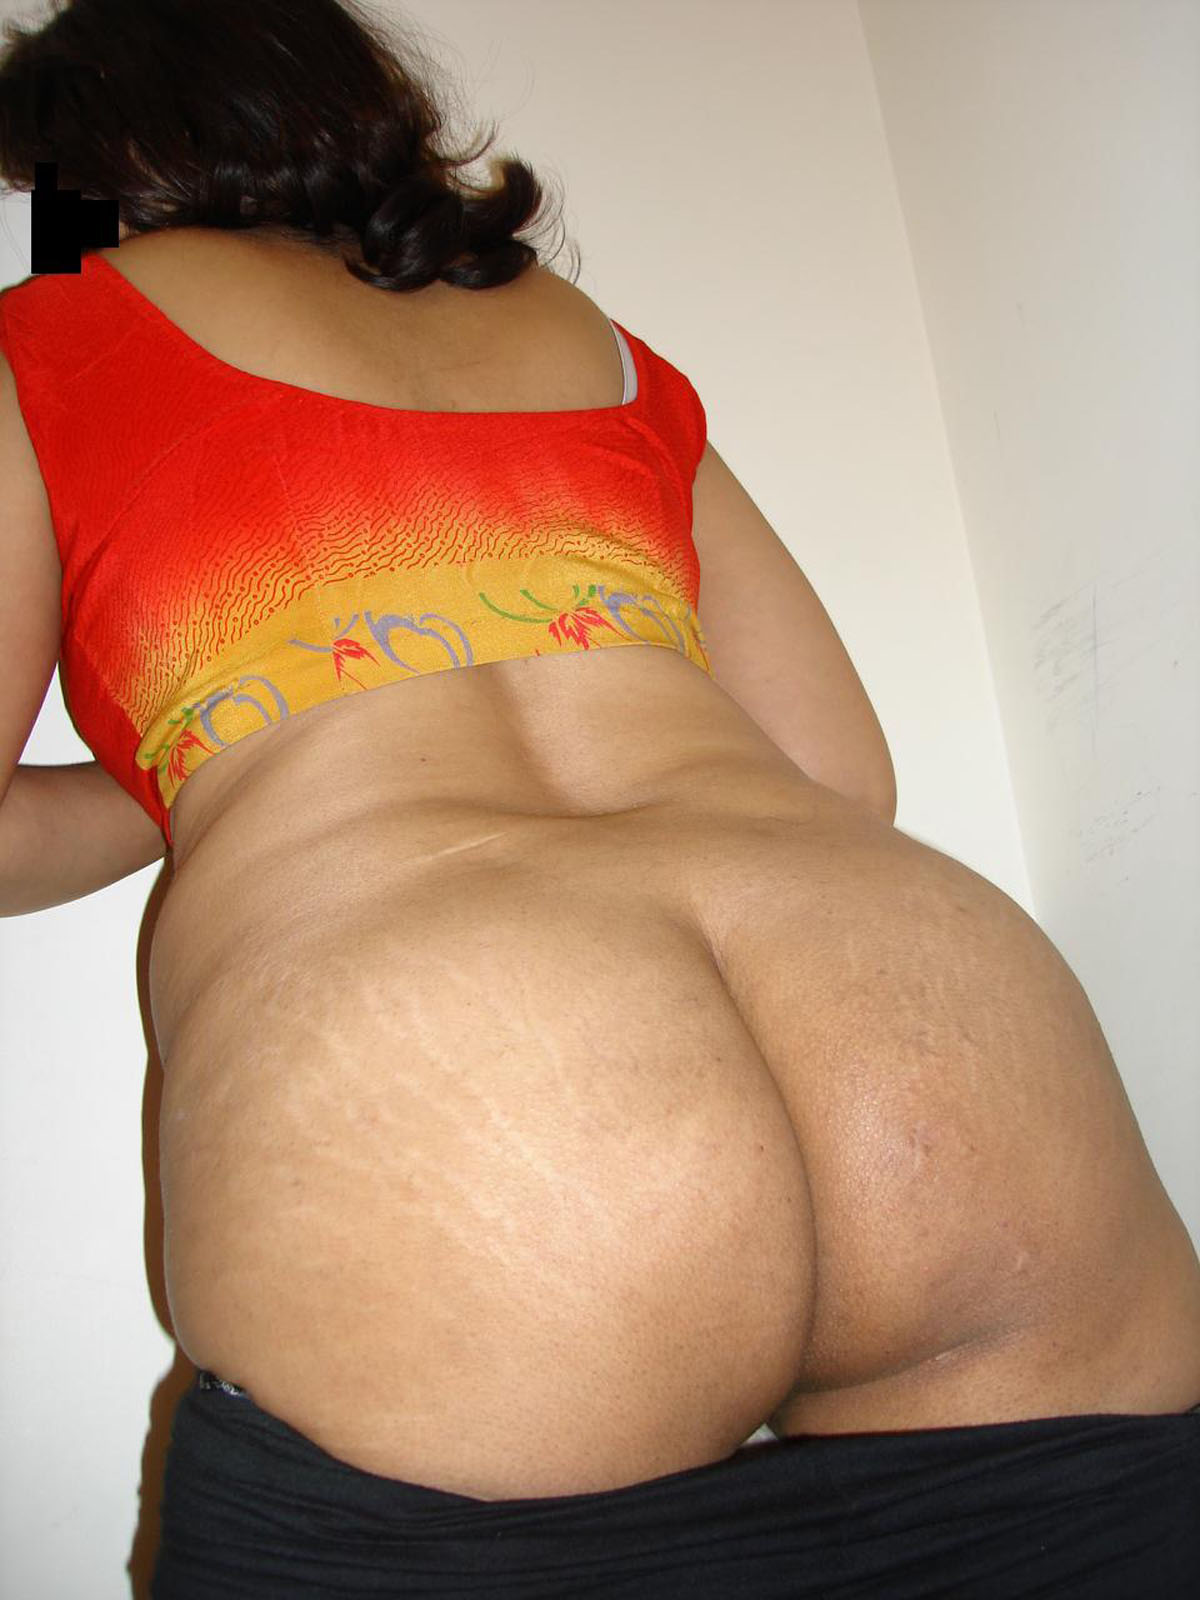 Mallu aunty huge butt hairy pussy pic